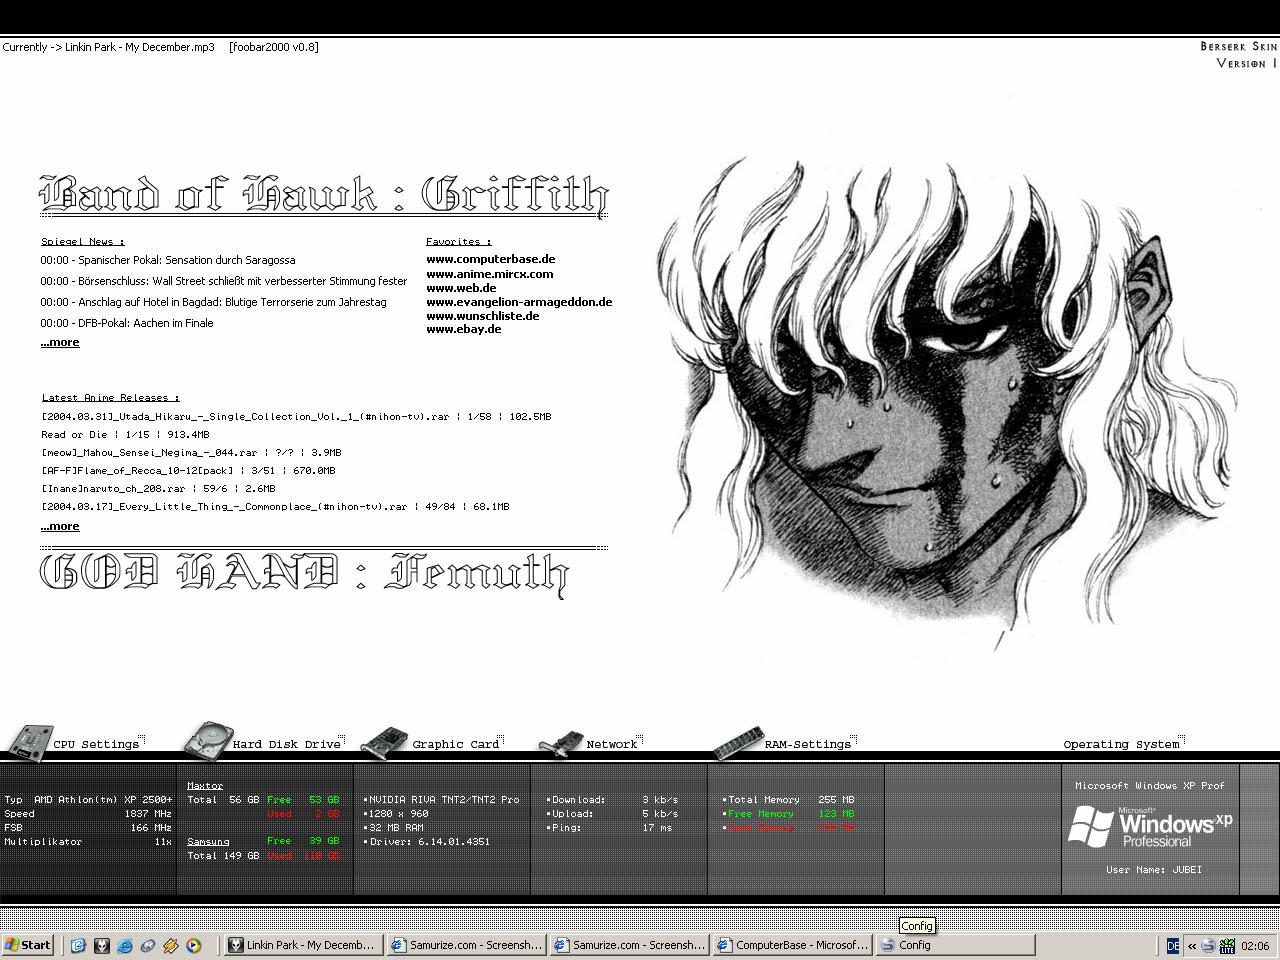 Title: Berserk Skin ver.1 || Griffith